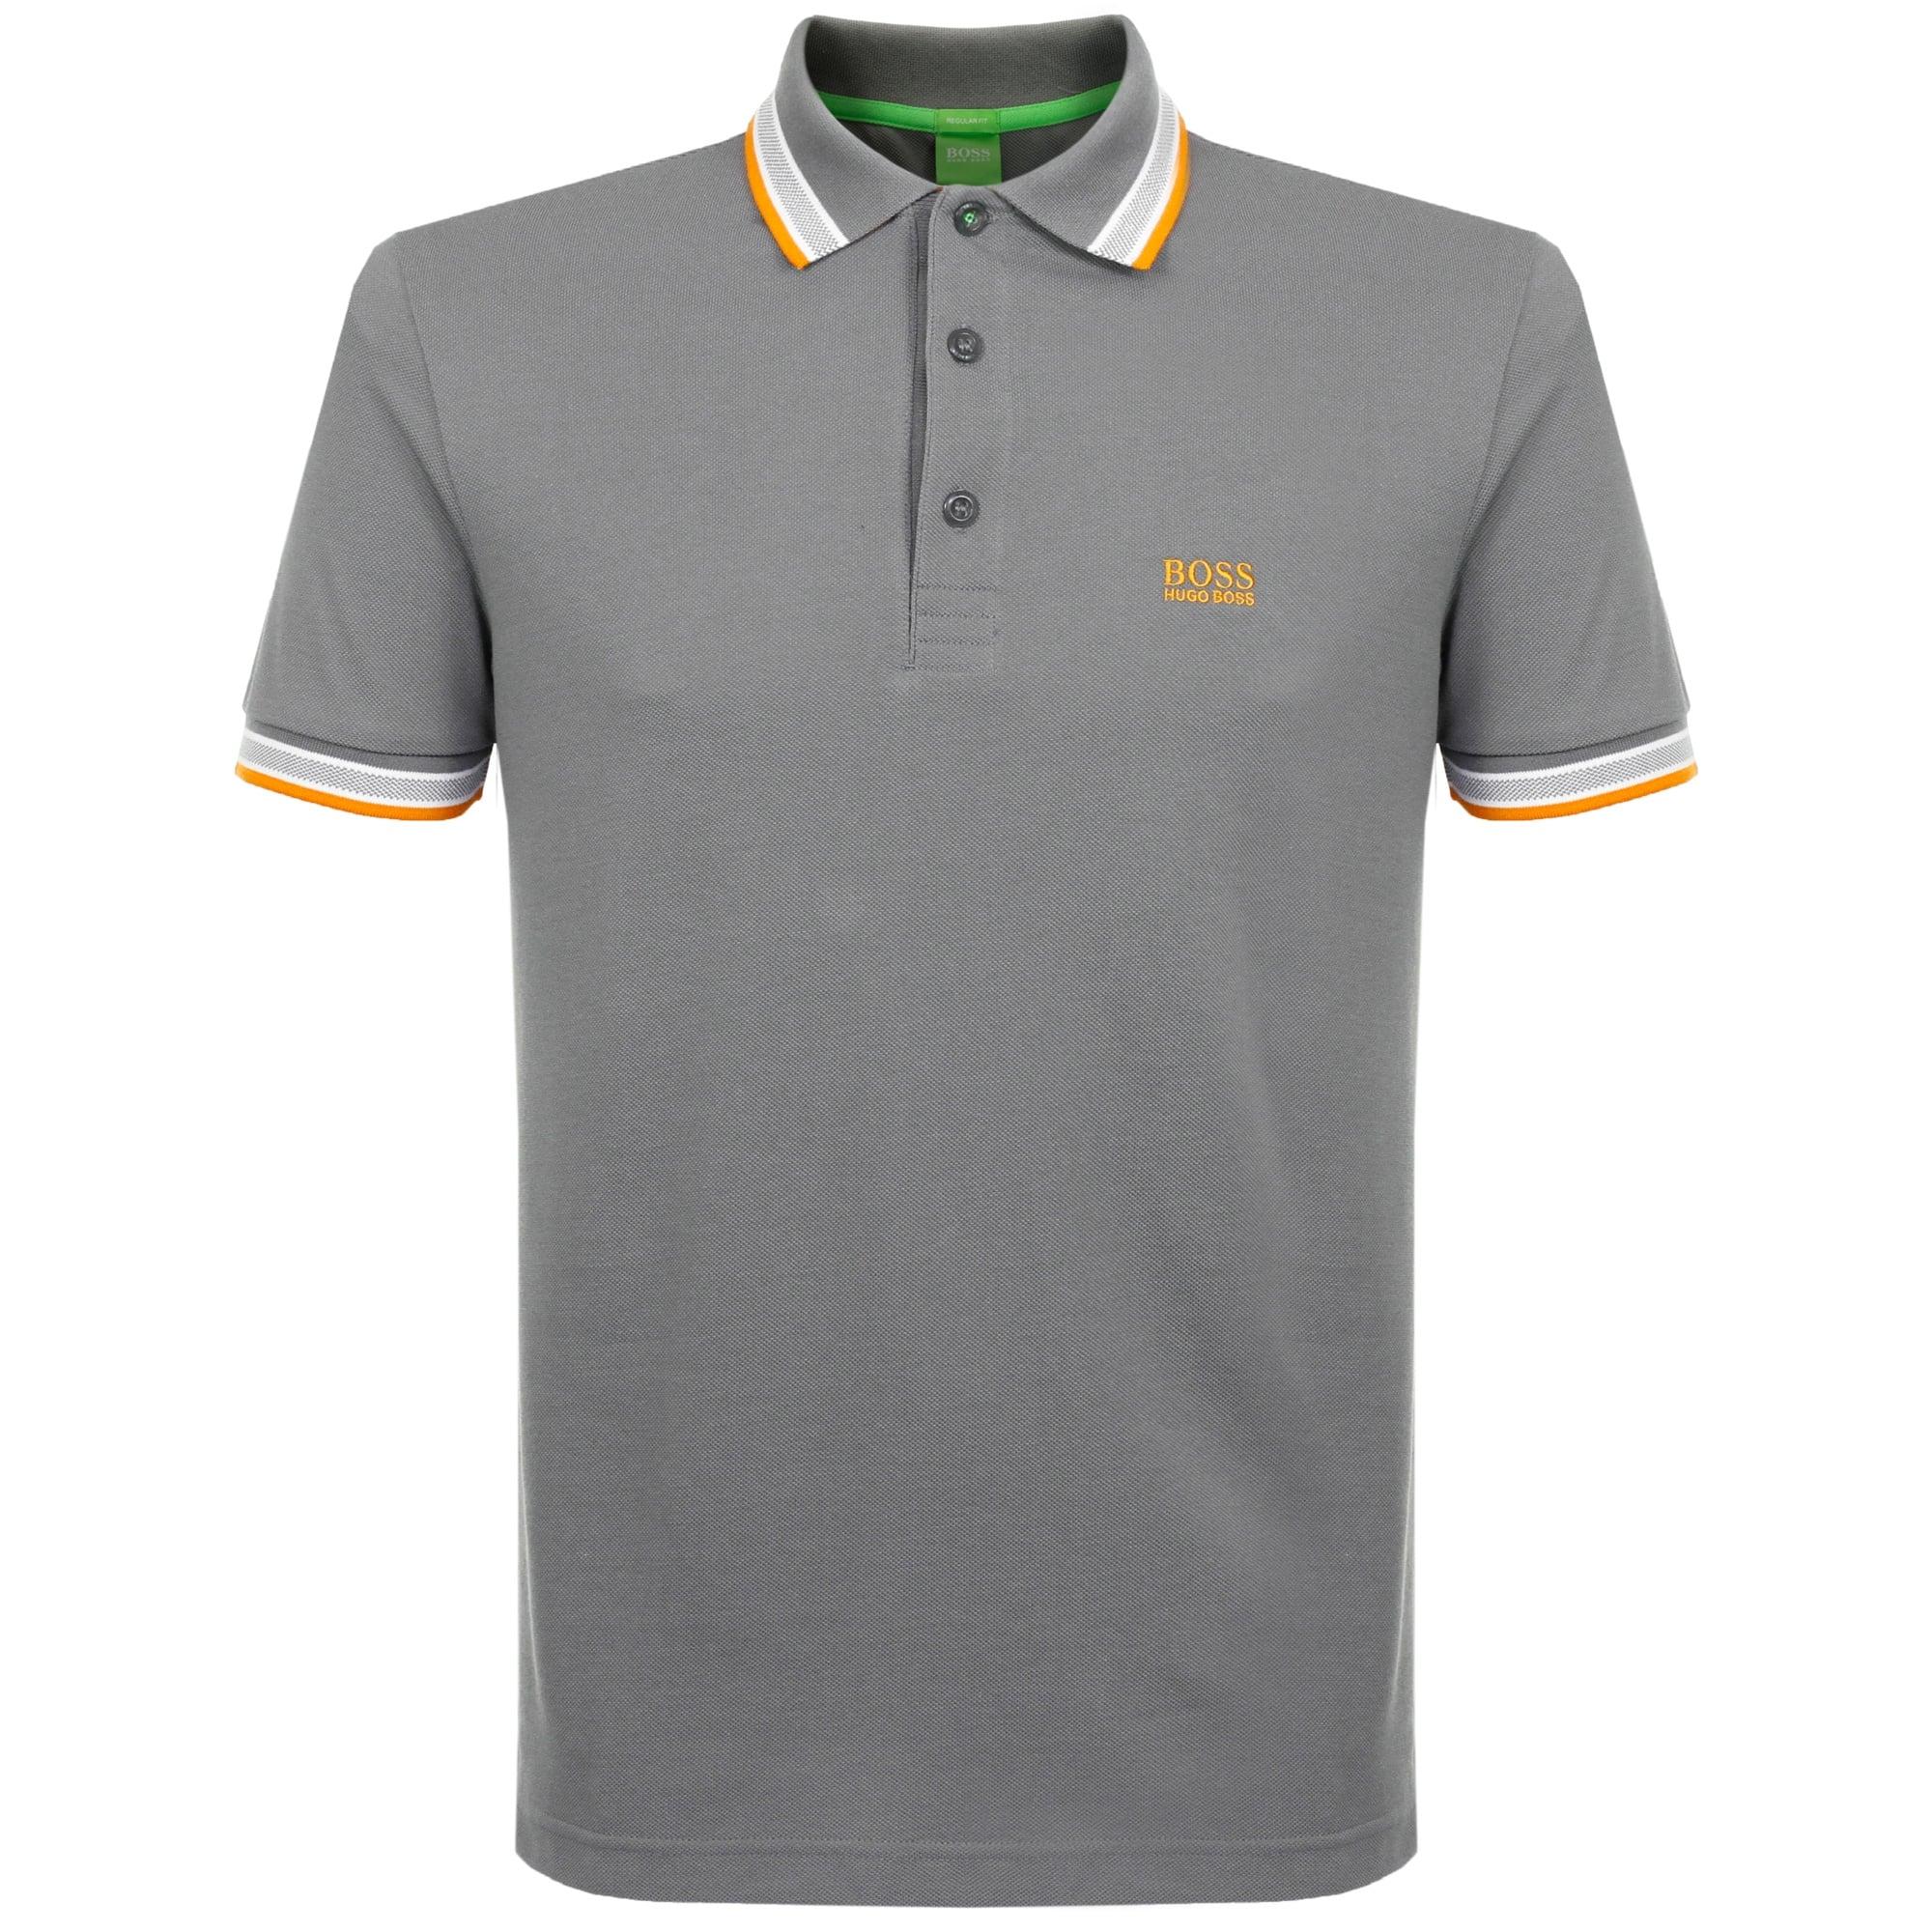 Hugo boss green shop medium grey polo shirt for Hugo boss dress shirt review